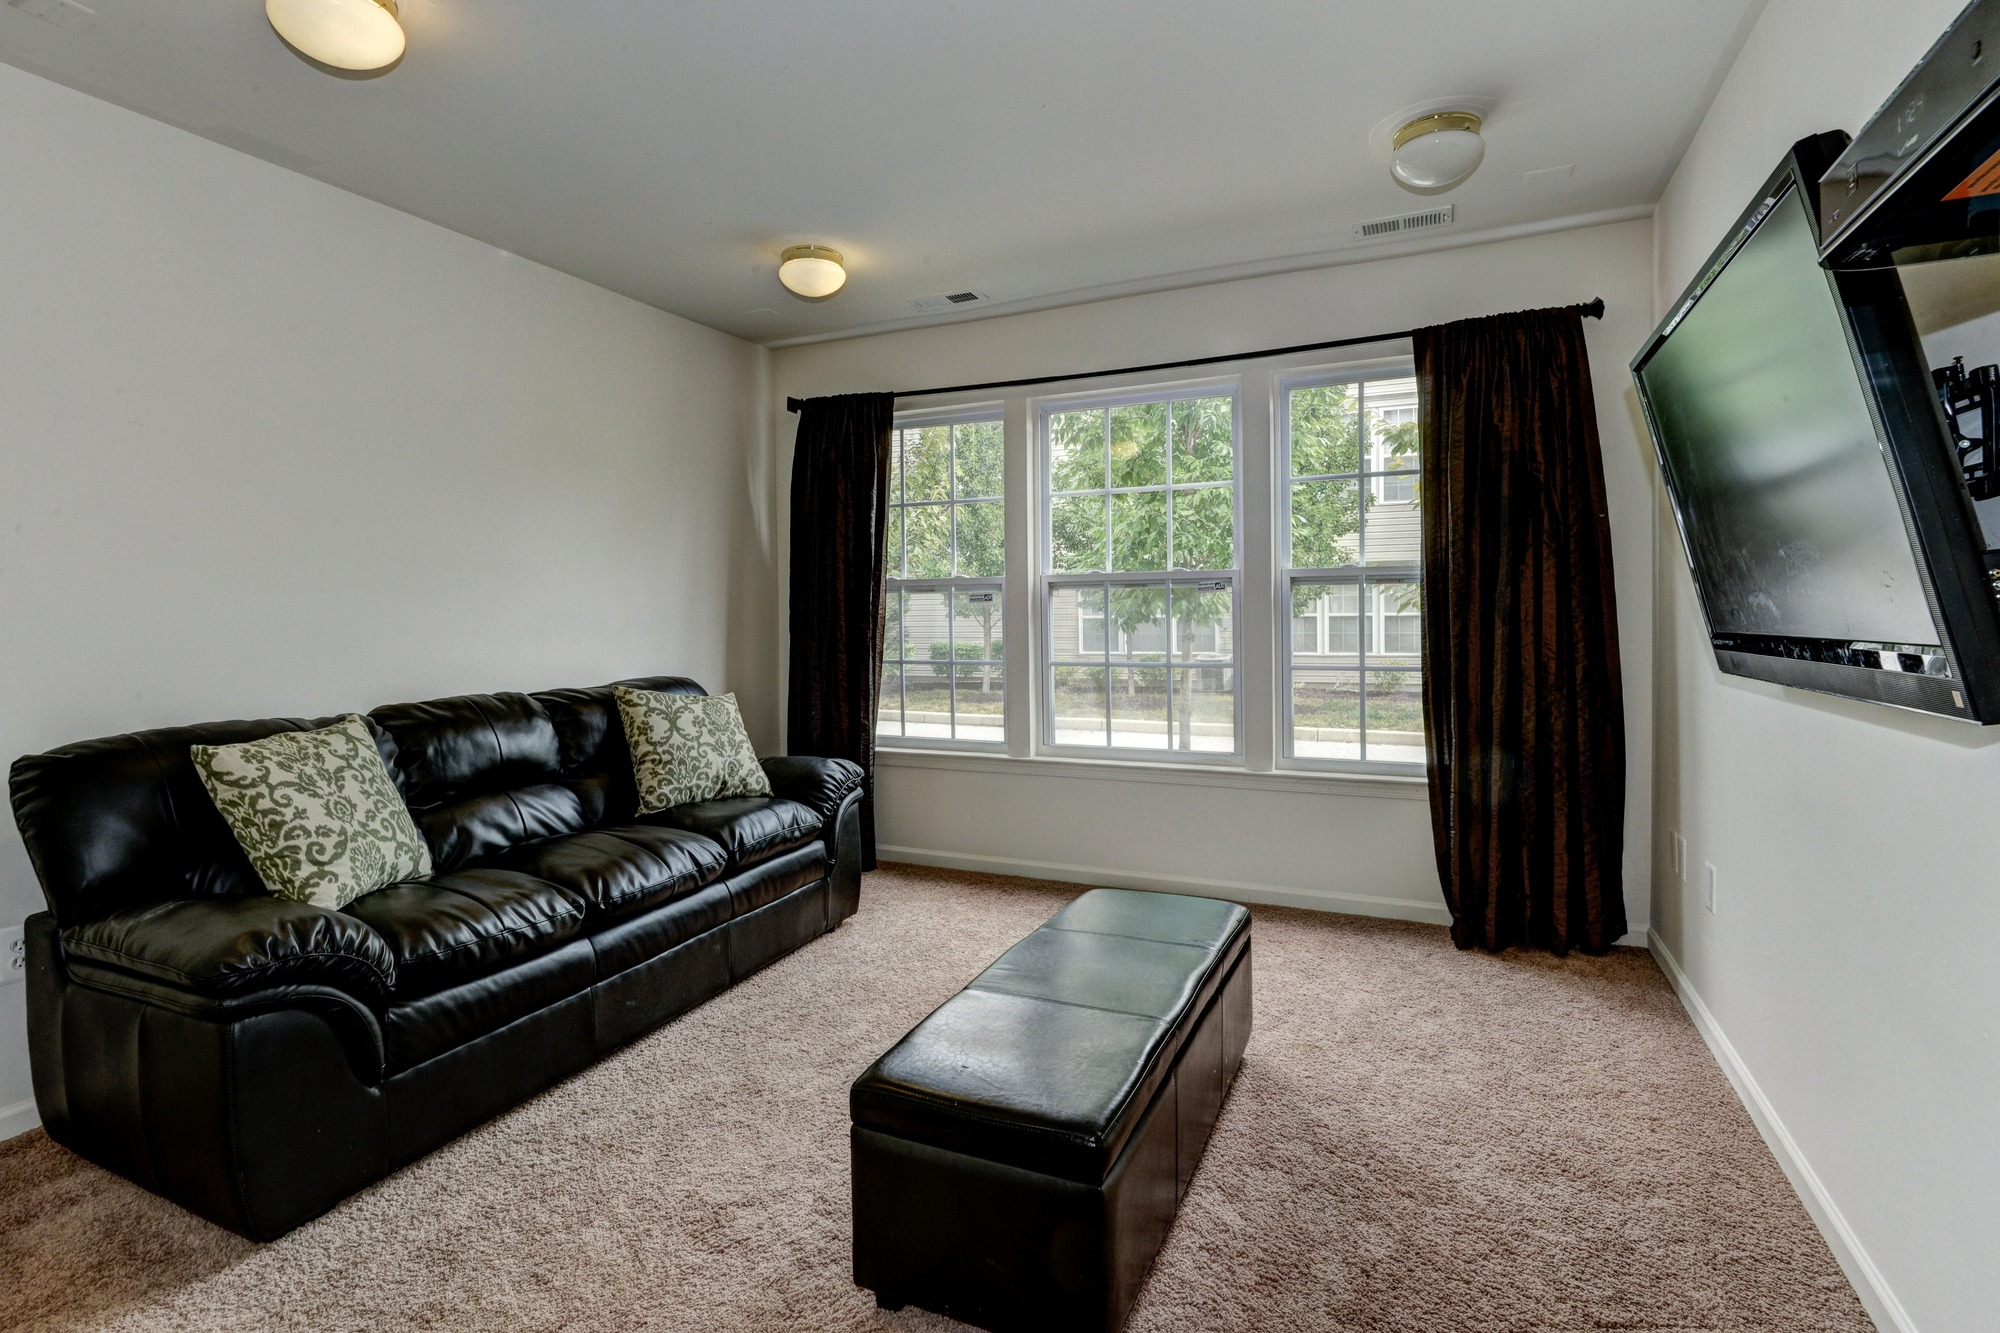 Model Homes Interiors Elkridge Md Home Decor